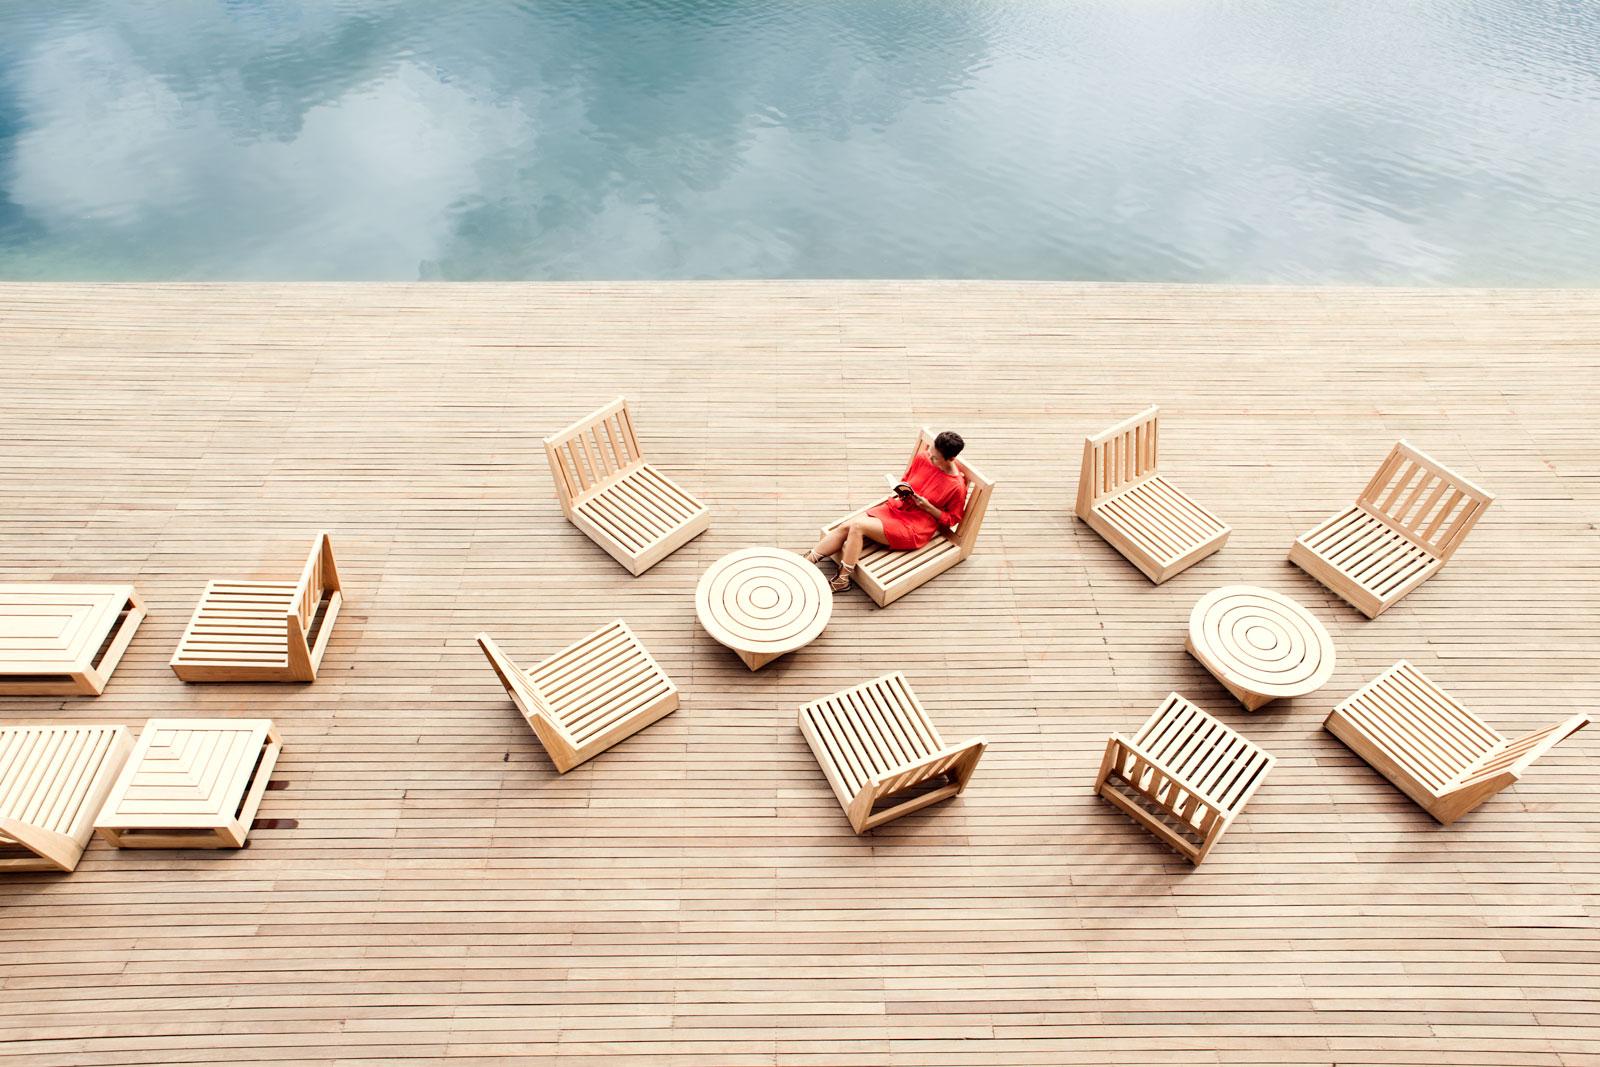 Fasano Boa Vista luxury hotel photographed by Martin Adolfsson for Conde Nast Traveler